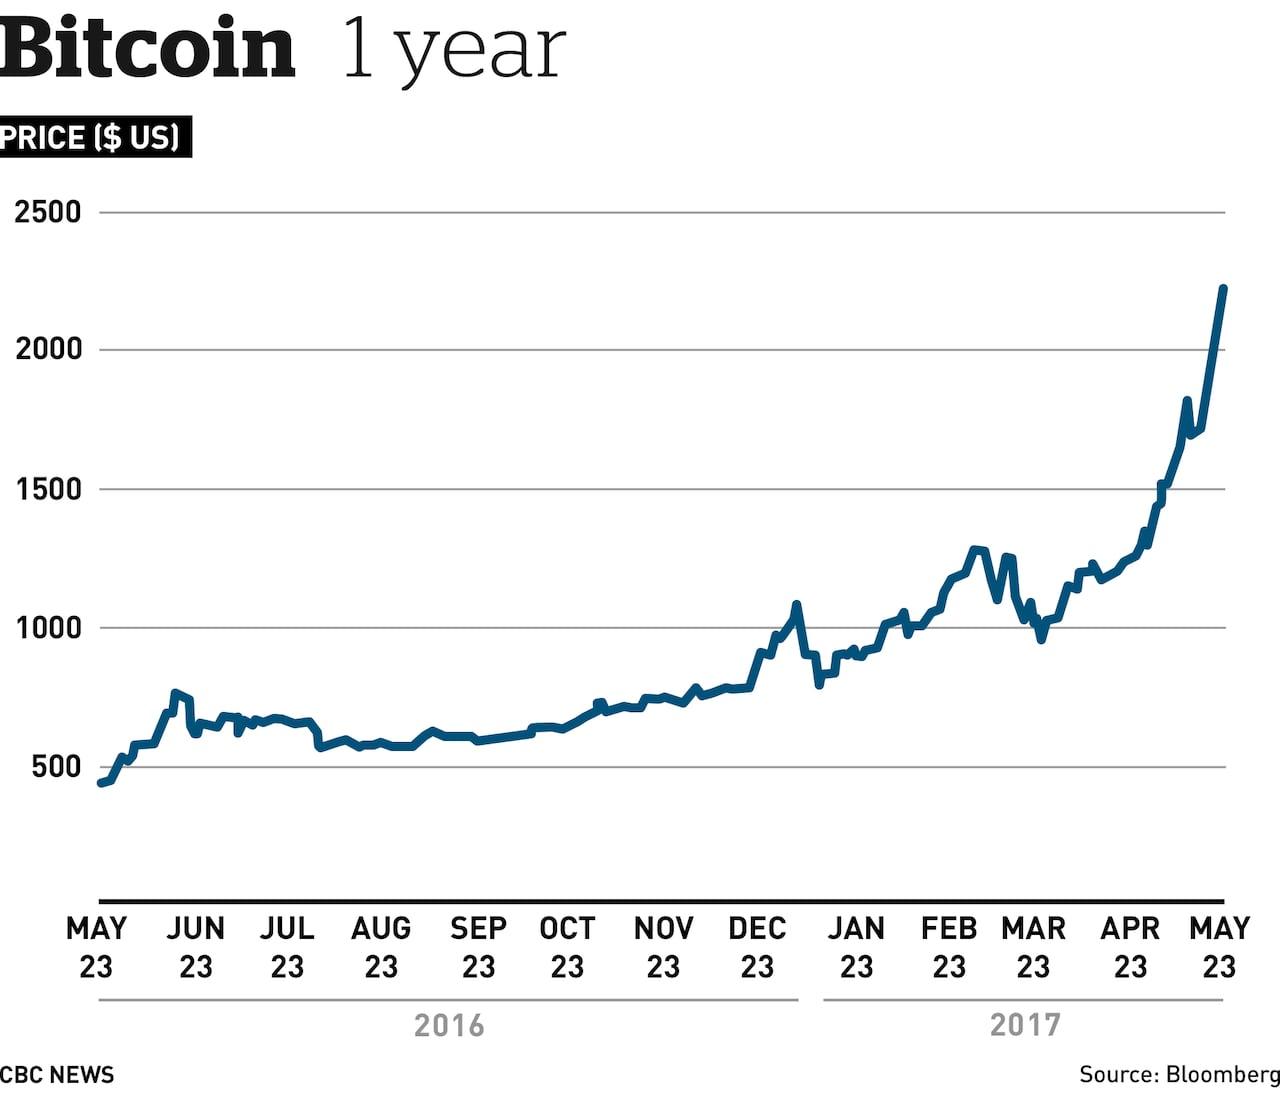 Cbc news bitcoins price falkirk vs livingstone bettingexperts